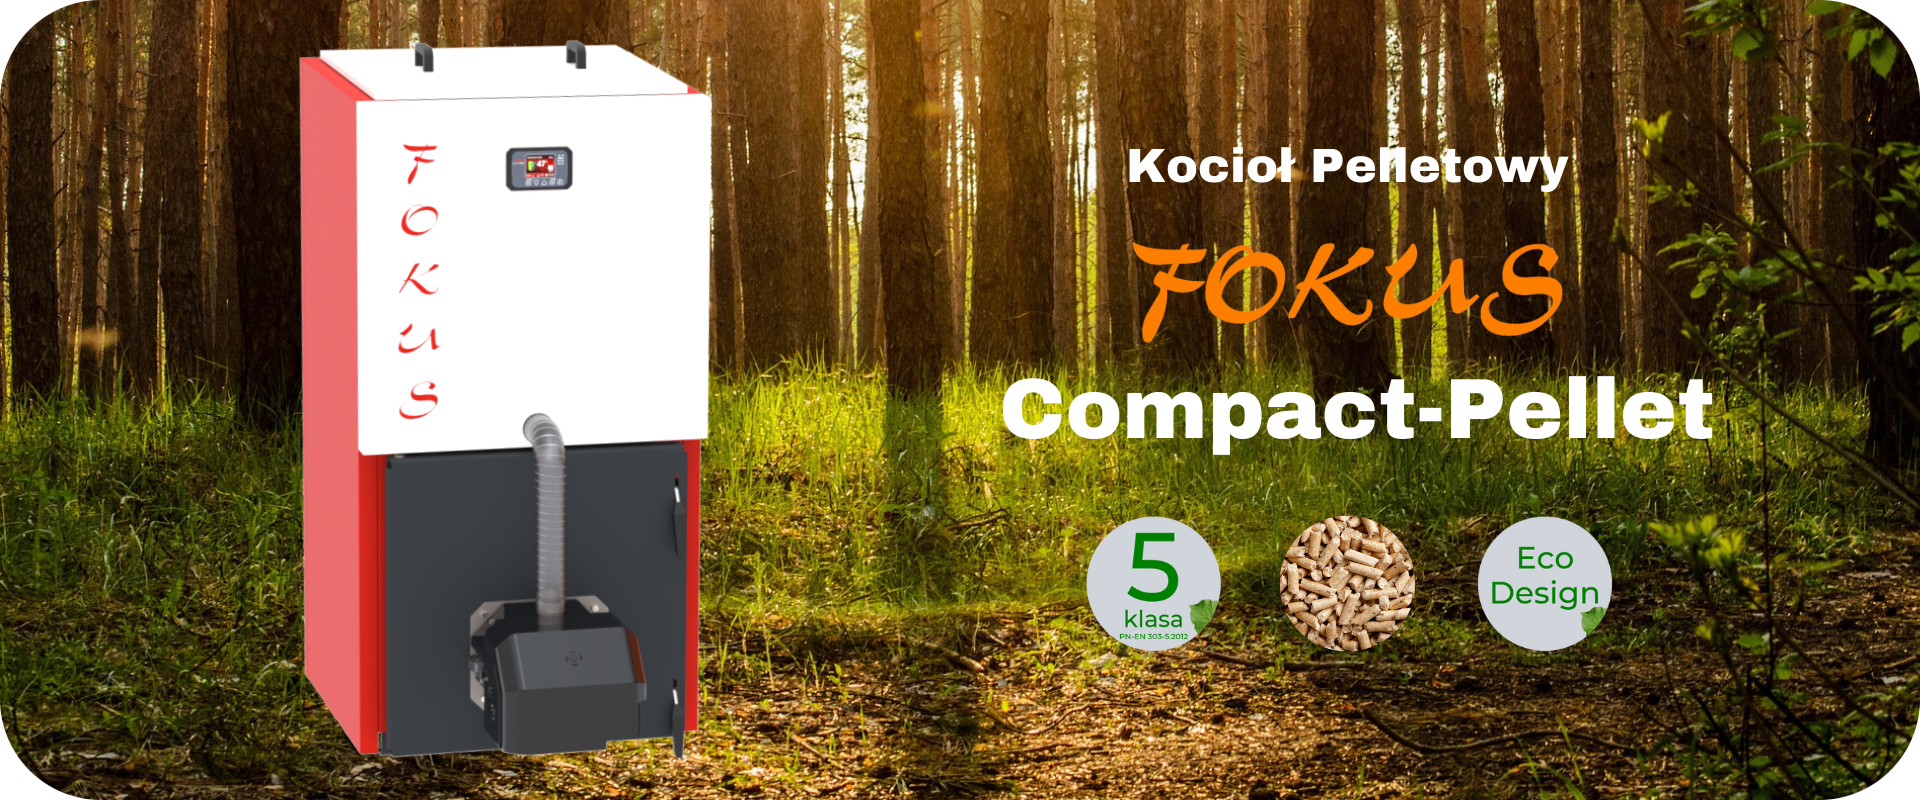 Banner Fokus Compact Pellet Home